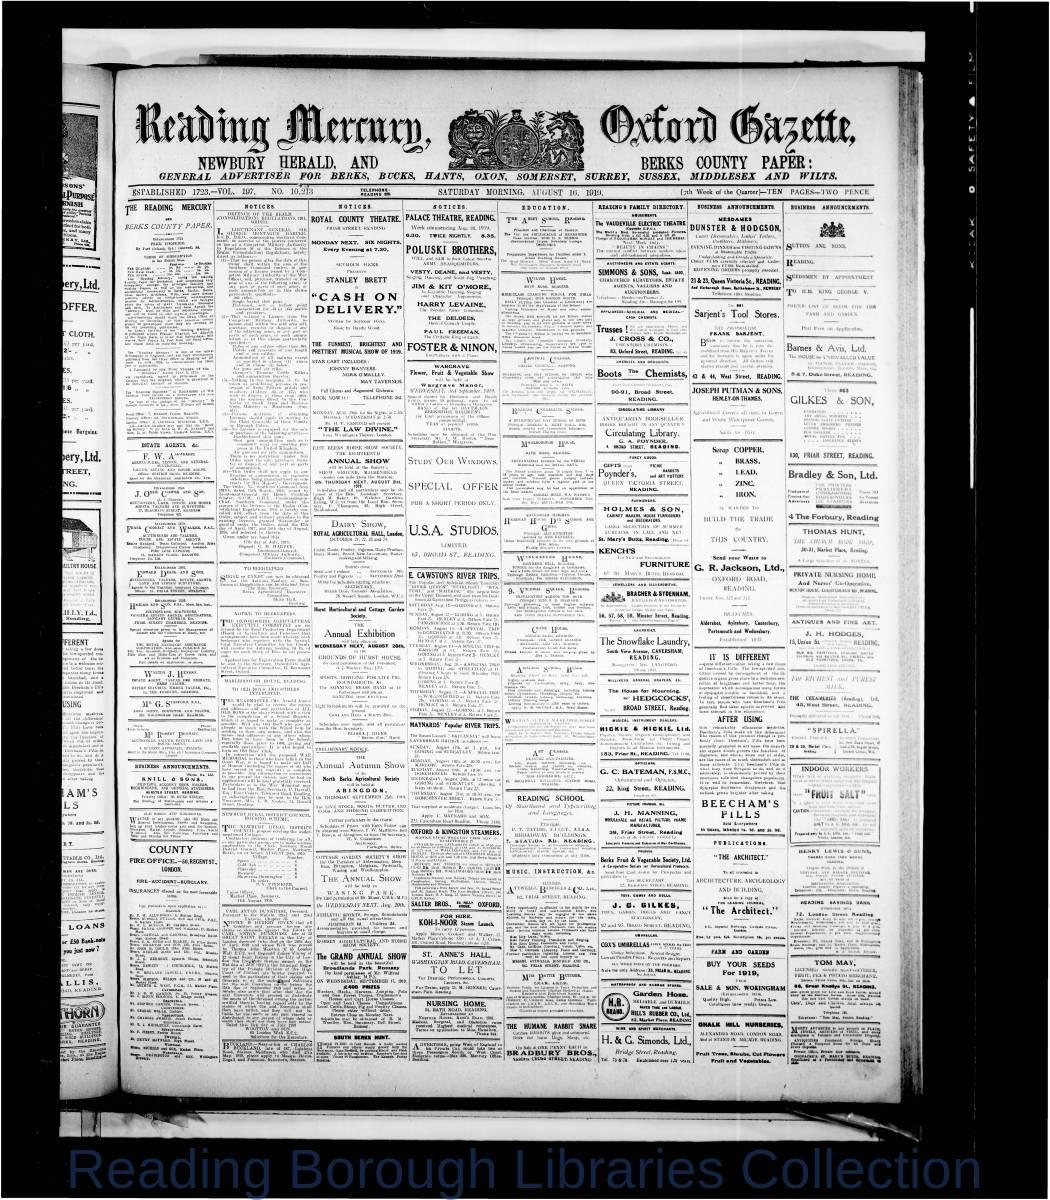 Reading Mercury Oxford Gazette Saturday, August 16, 1919. Pg 1